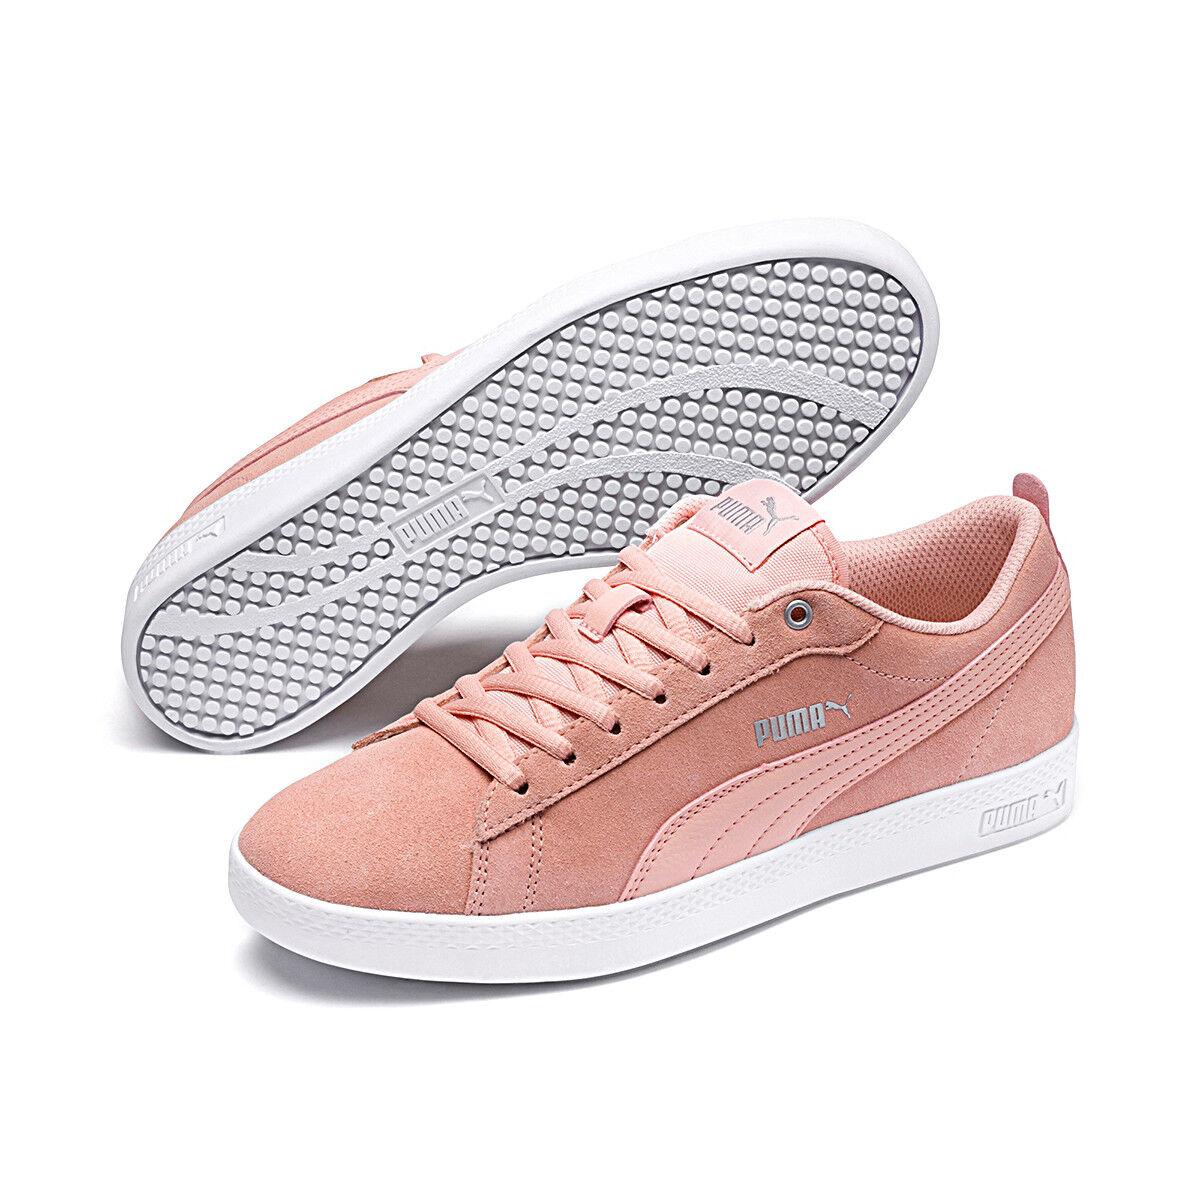 Sneaker Damen Altrosa Test Vergleich +++ Sneaker Damen